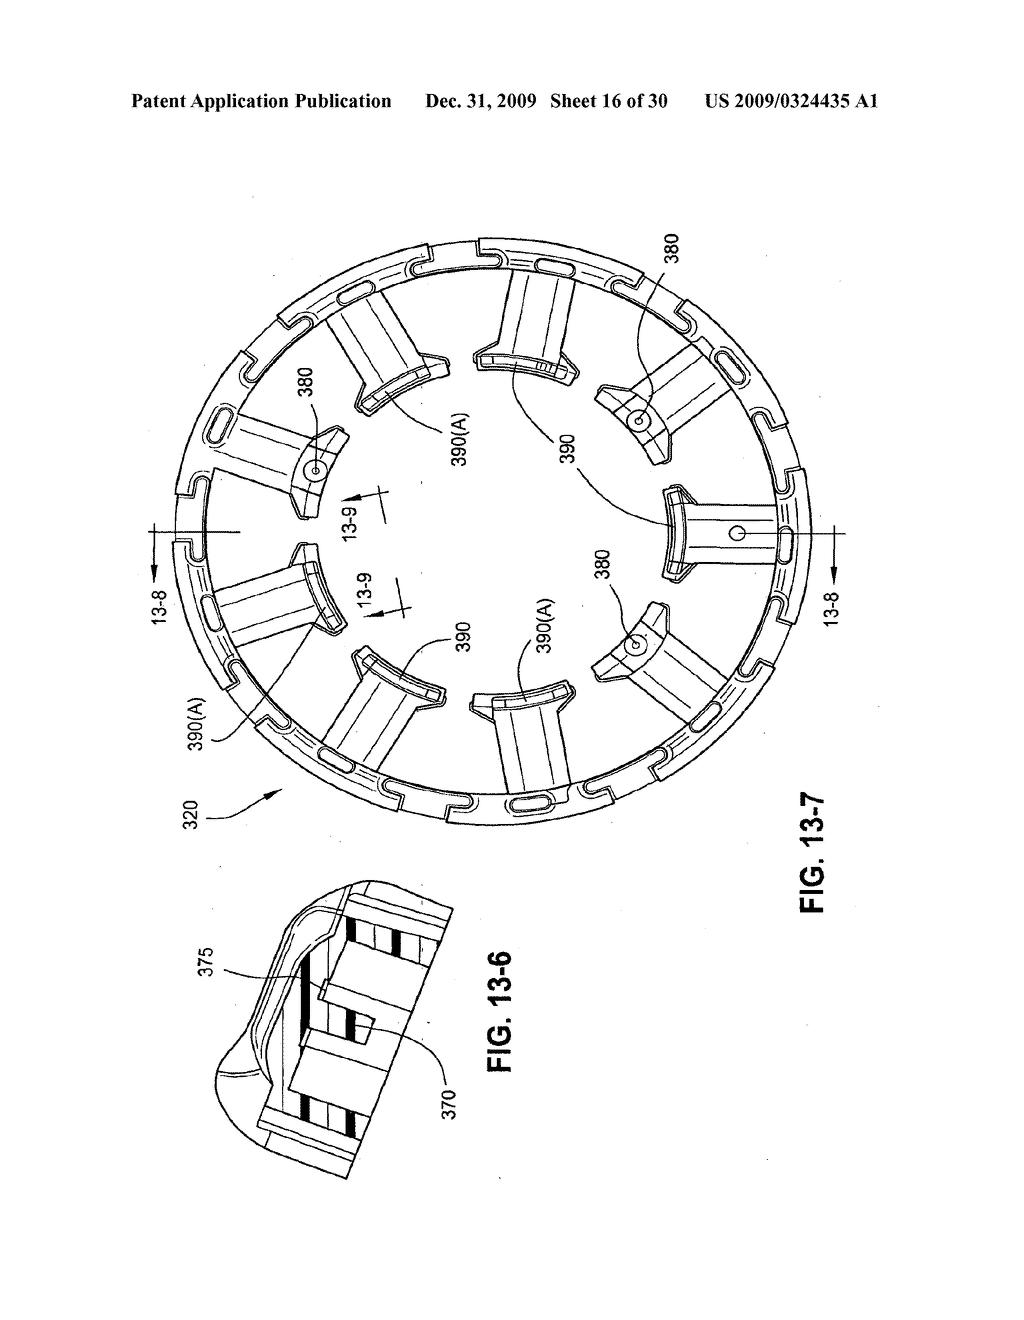 insulator for stator assembly of brushless dc motor diagram DC Motor Circuit Model insulator for stator assembly of brushless dc motor diagram schematic and image 17